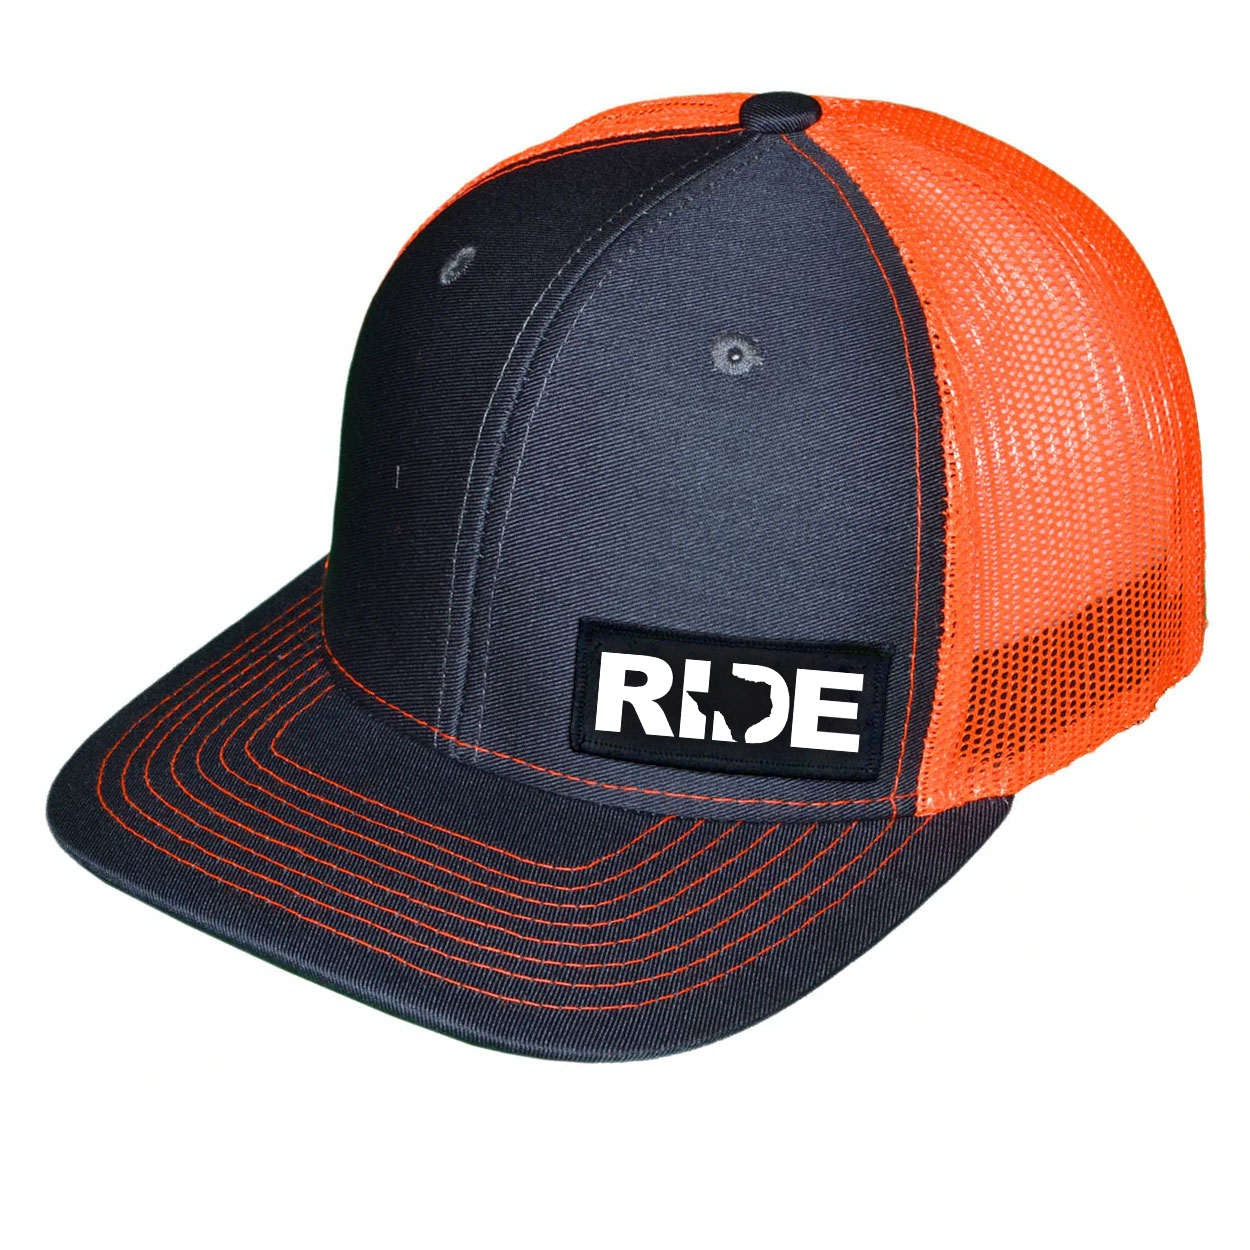 Ride Texas Night Out Woven Patch Snapback Trucker Hat Dark Gray/Orange (White Logo)